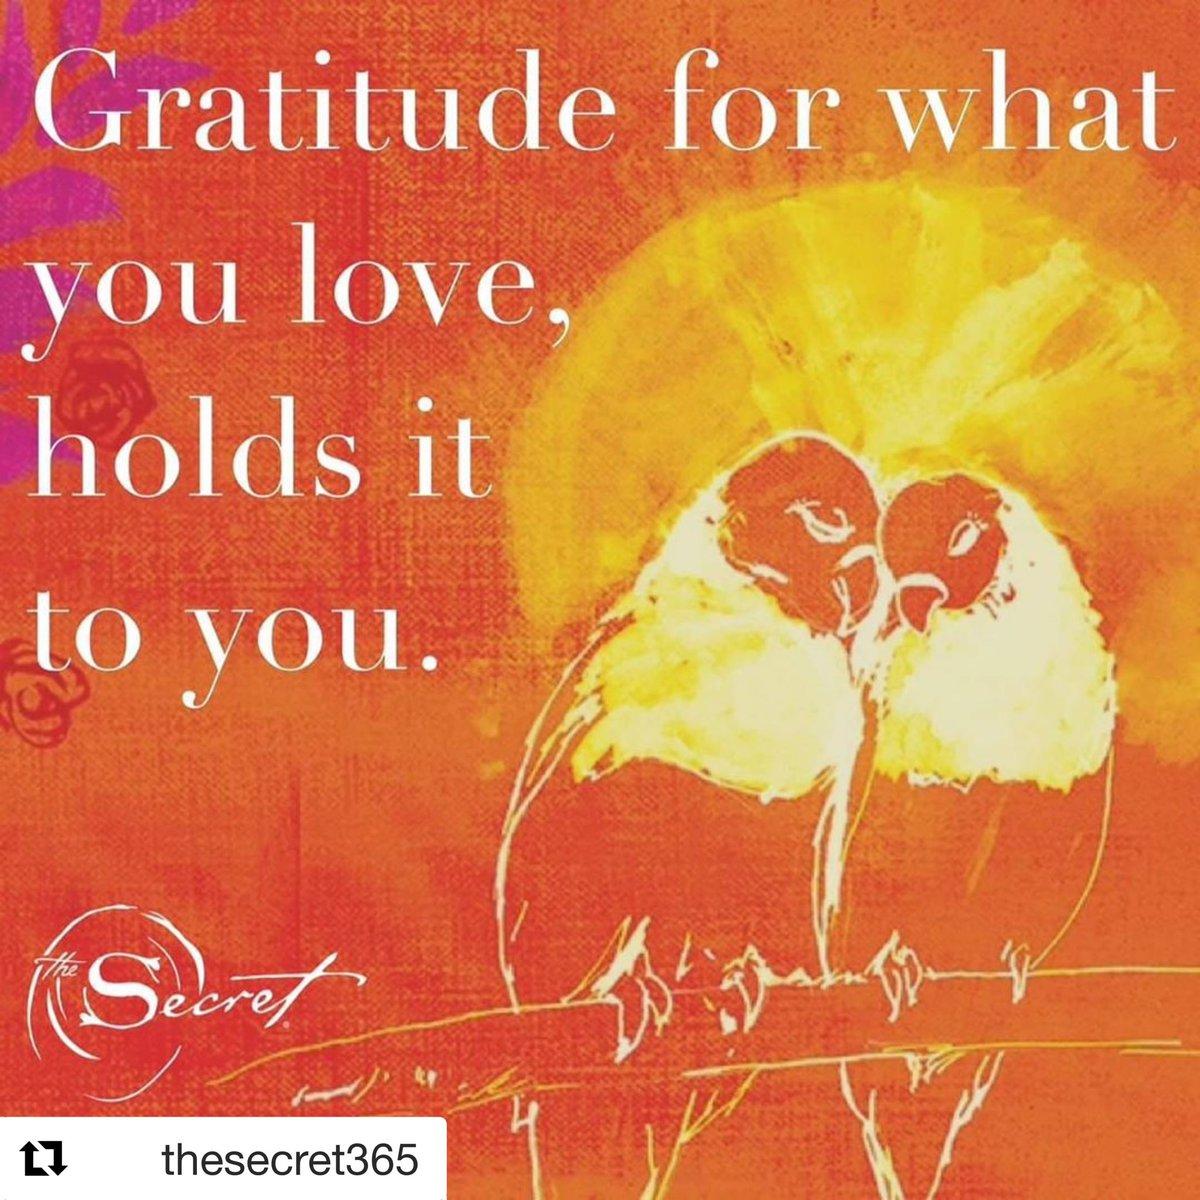 #gratitude #thesecret #positivevibes  #positivegedanken #universe #serpositivo #energiaspositivas pic.twitter.com/MbAuXzoTtl